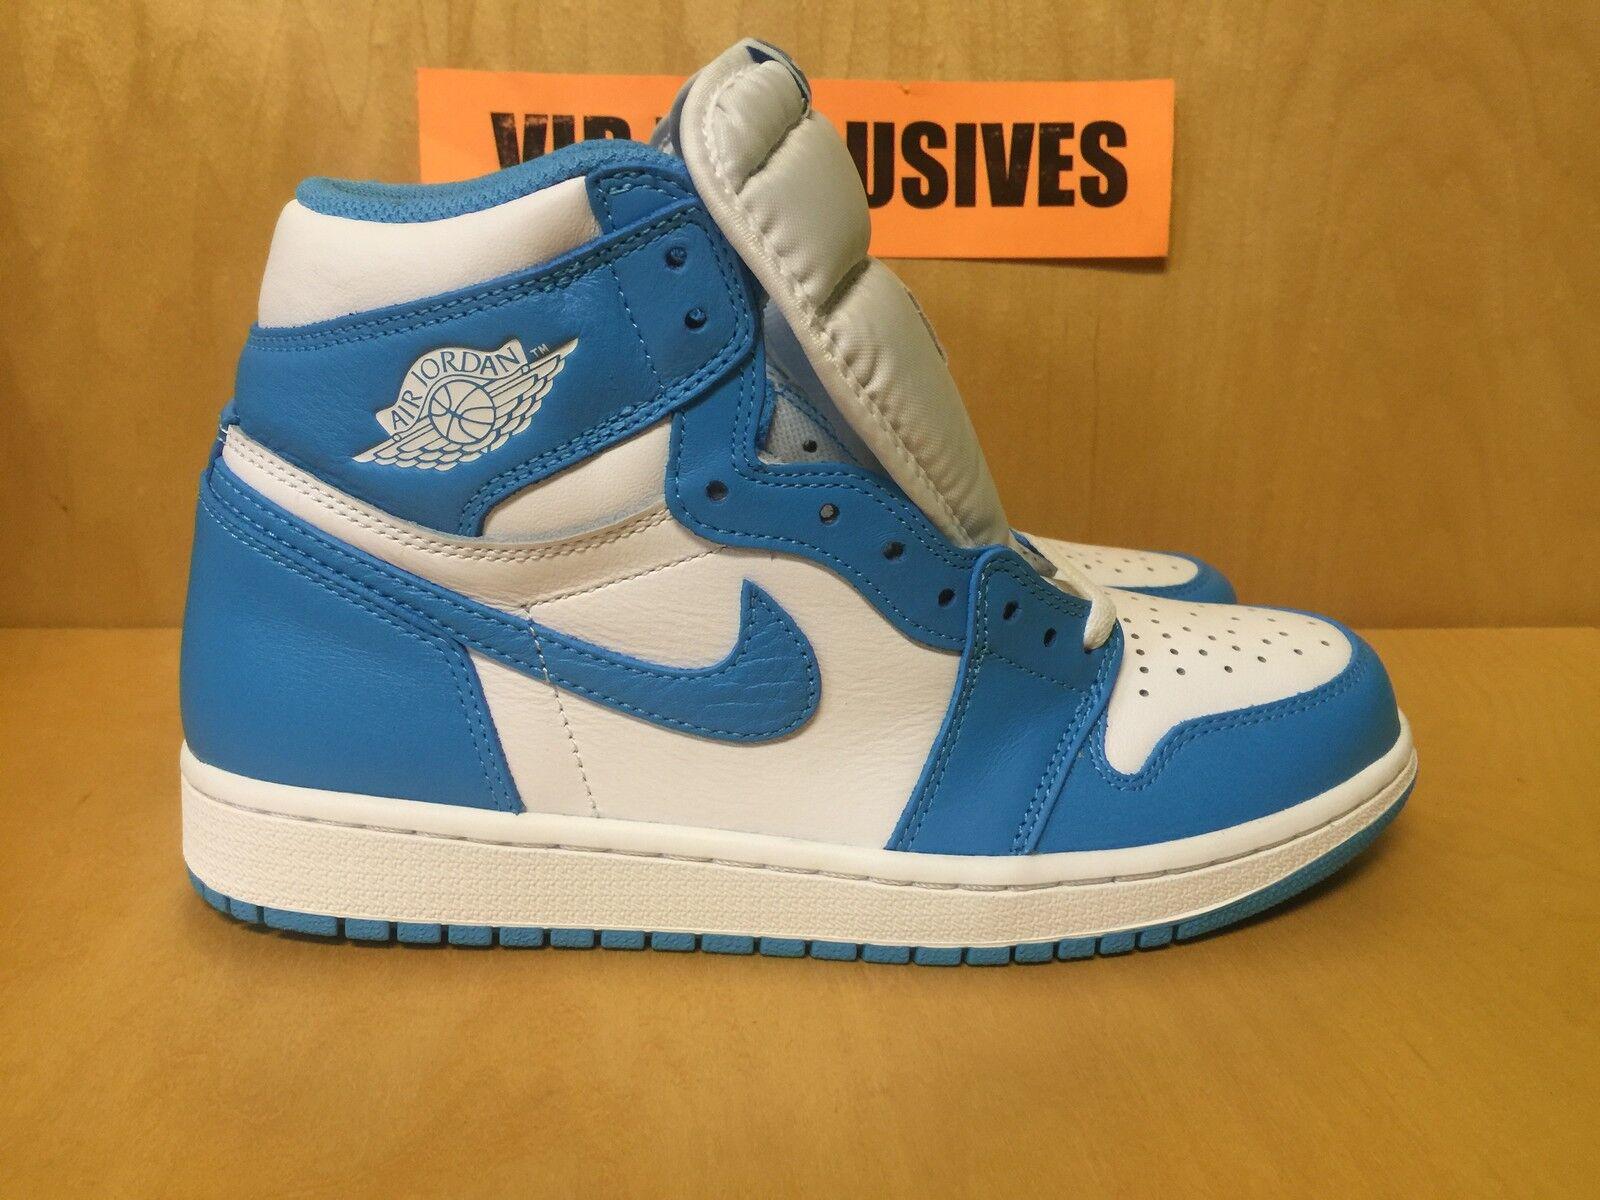 Nike Air Jordan 1 Retro High OG UNC Carolina Powder bluee 555088-117 SHIPPING NOW